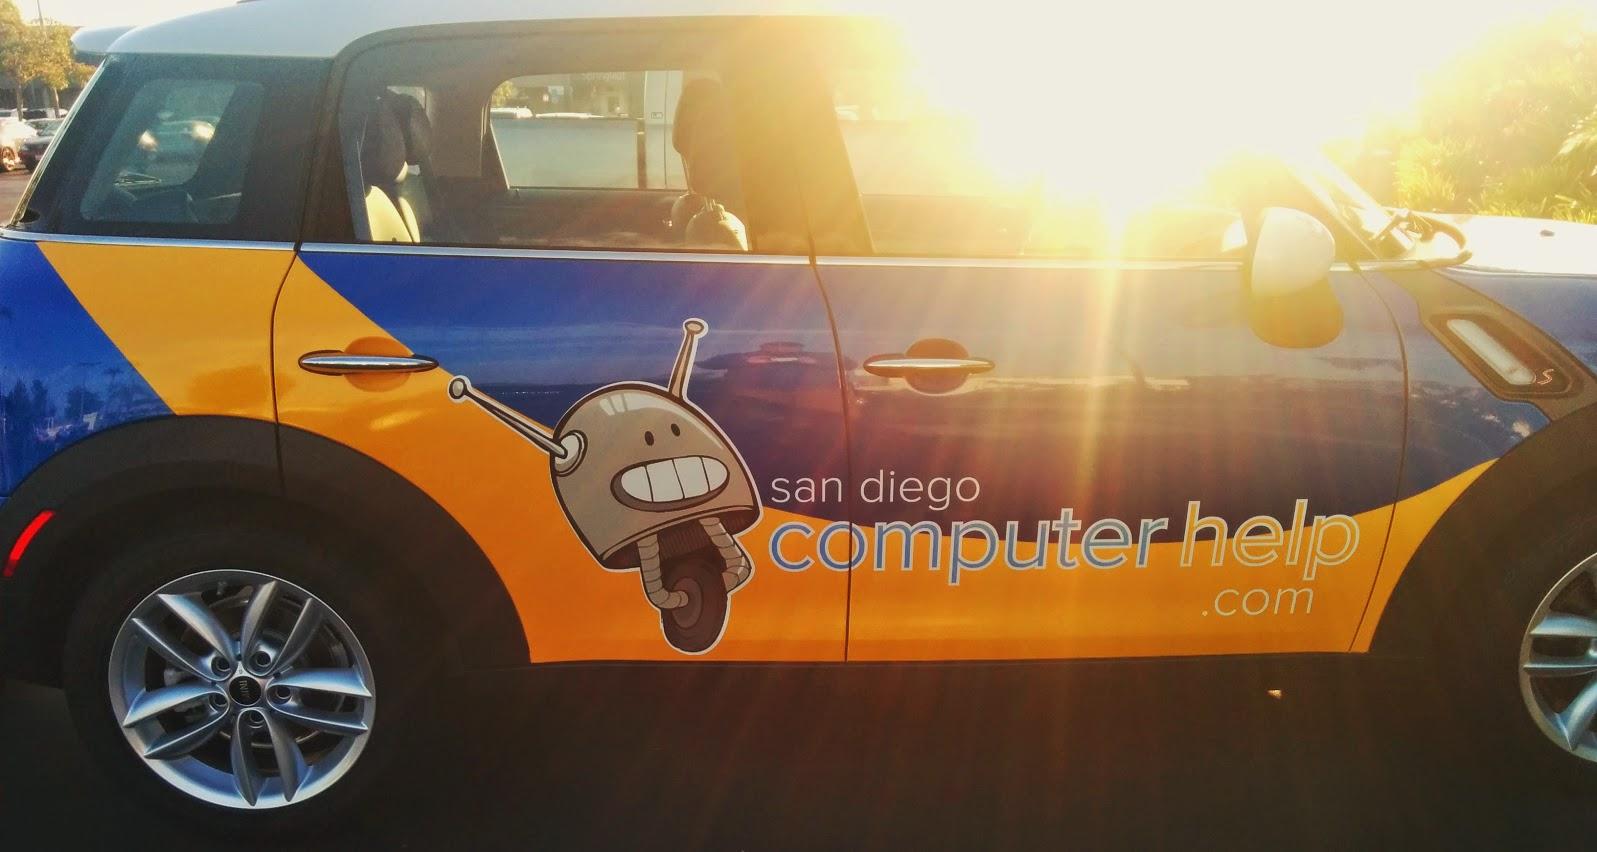 San Diego Computer Help logo